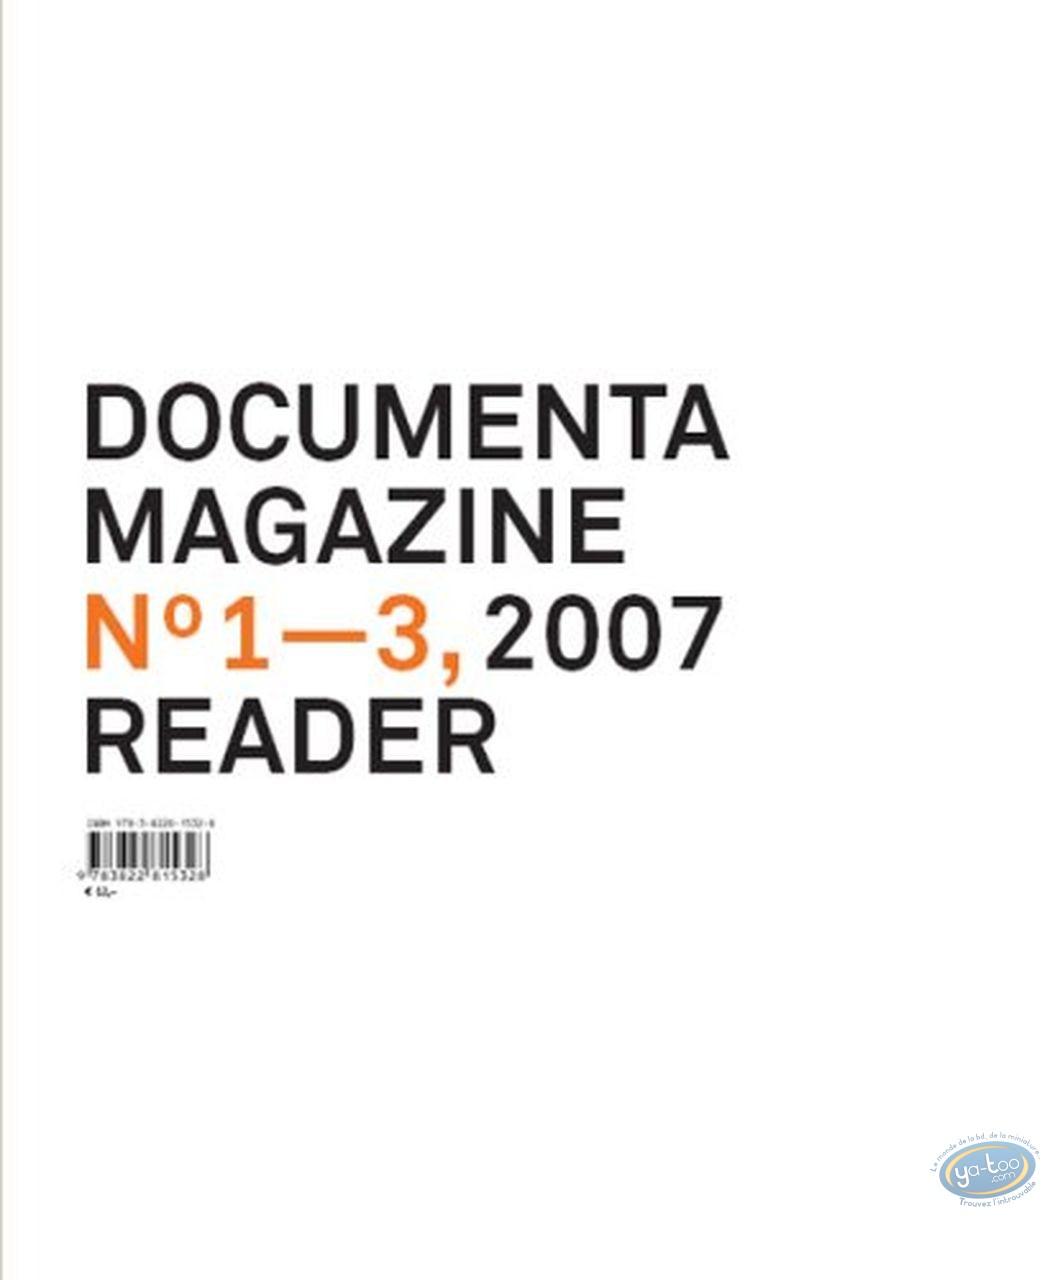 Livre, Documenta 12 magazine, n° 1-3